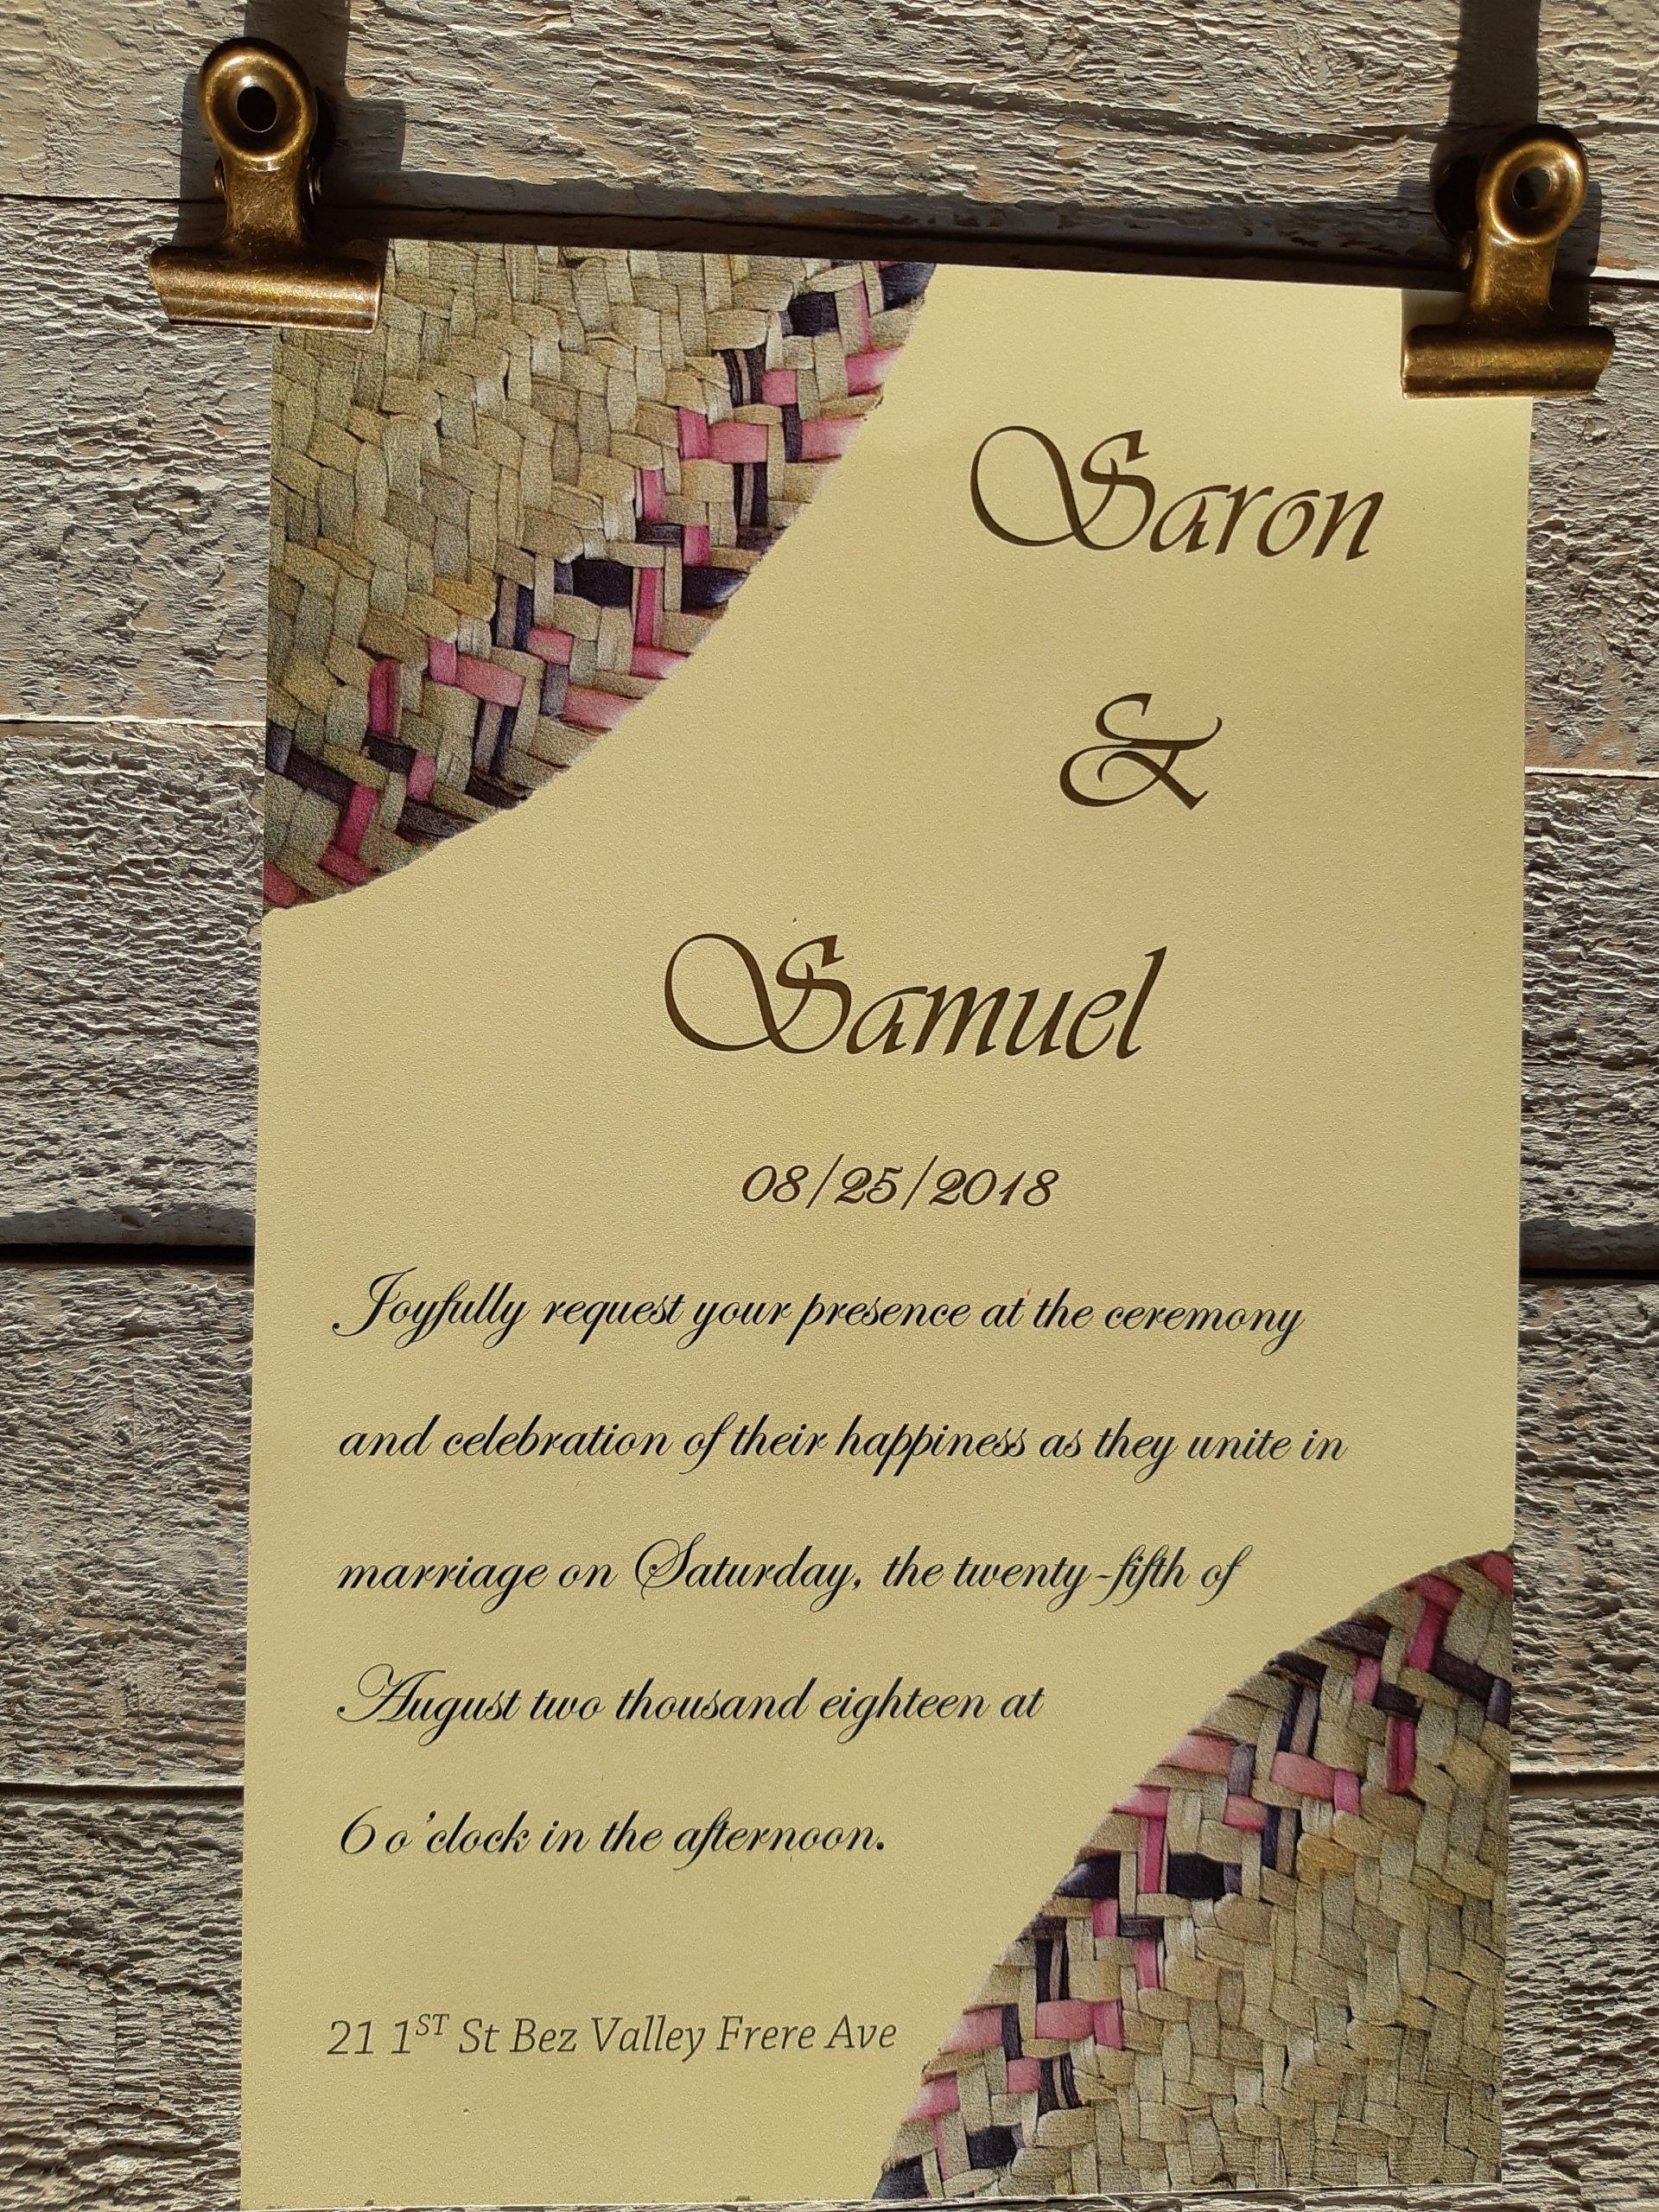 Traditional Wedding Cards With Regard To Newest Wedding Ideas Makei In 2020 Wedding Invitation Cards Modern Wedding Invitation Wording Wedding Invitation Card Design